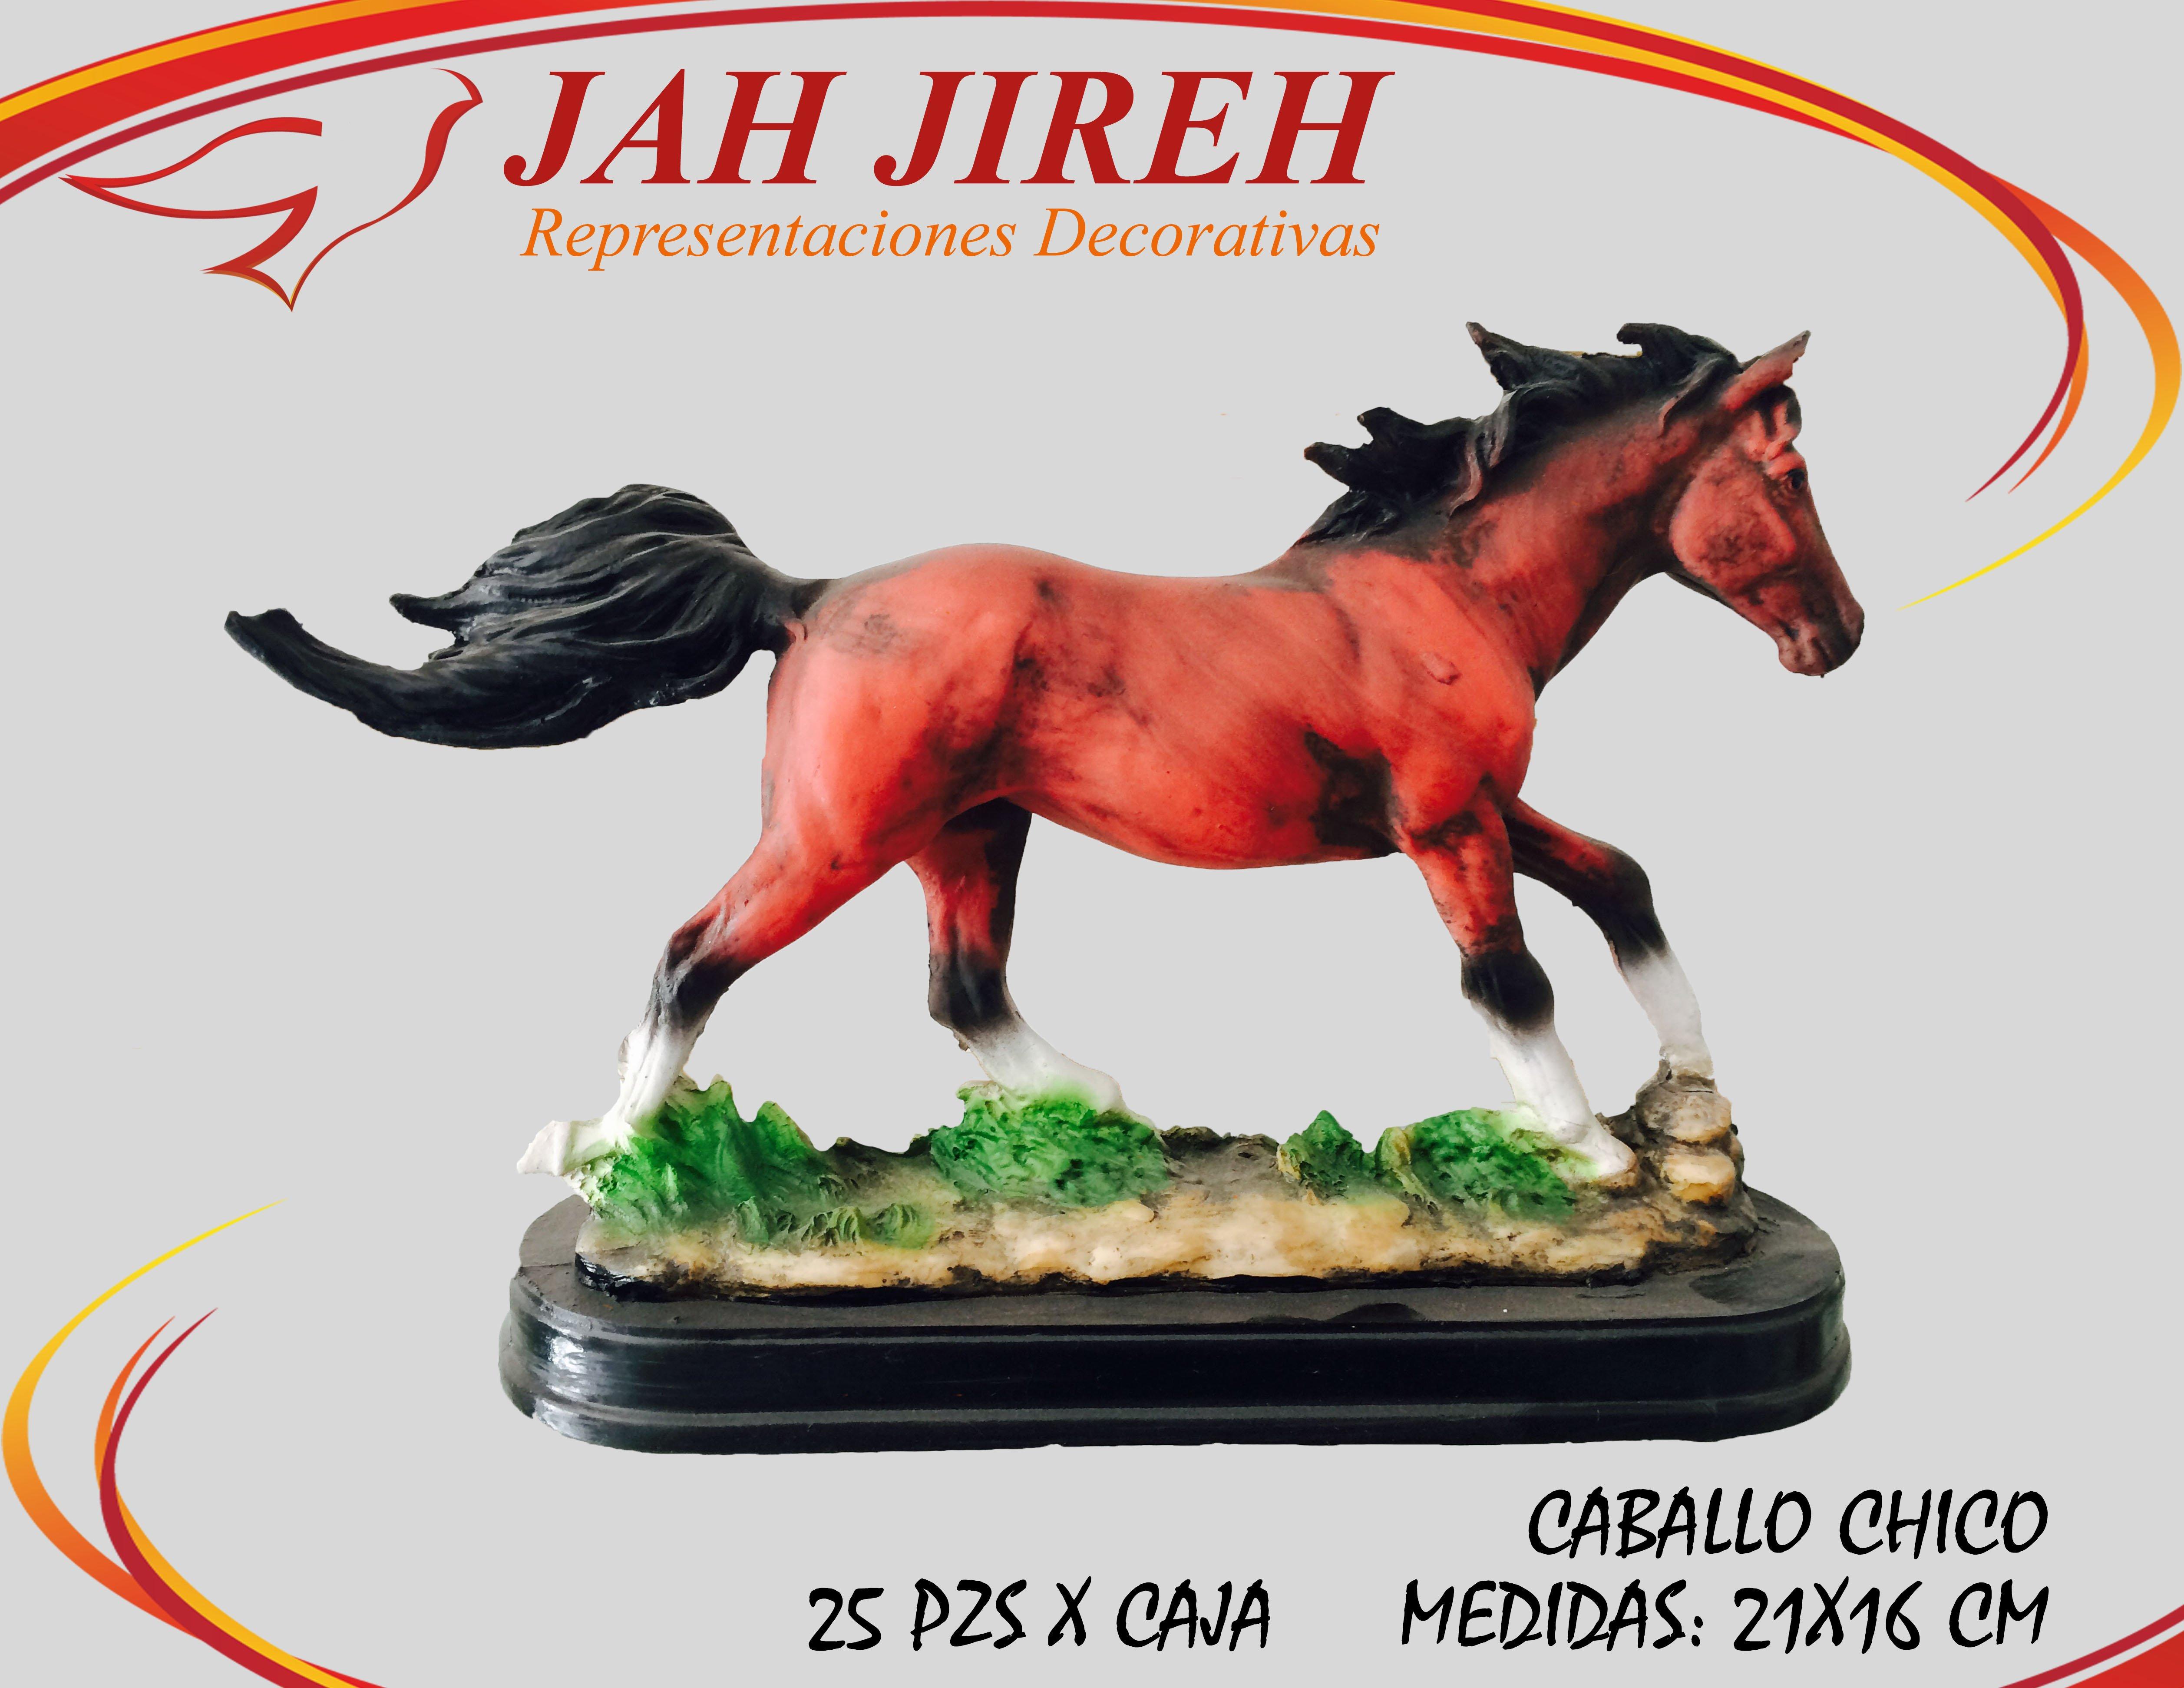 https://0201.nccdn.net/1_2/000/000/0eb/747/caballo-chico.jpg